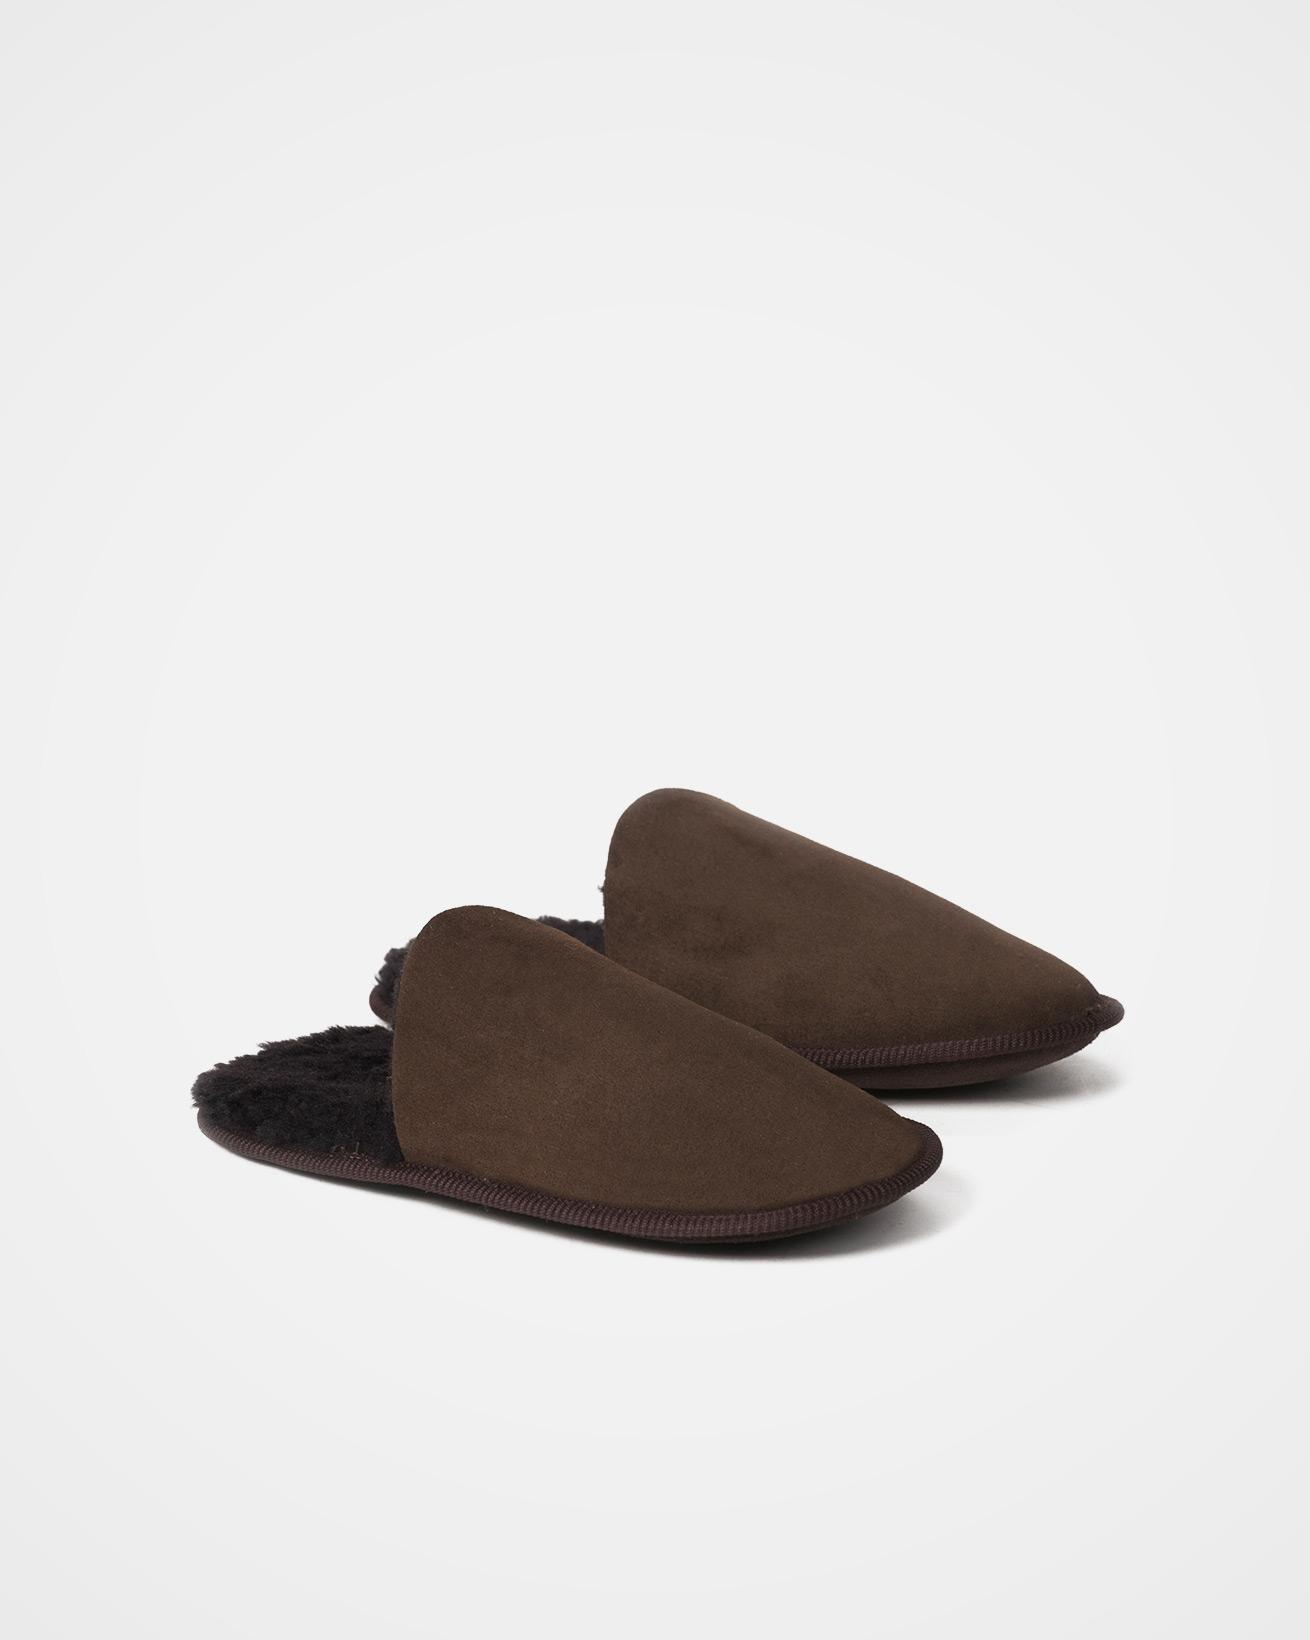 Sheepskin Scuffs - Size XL - Mocca - 2040